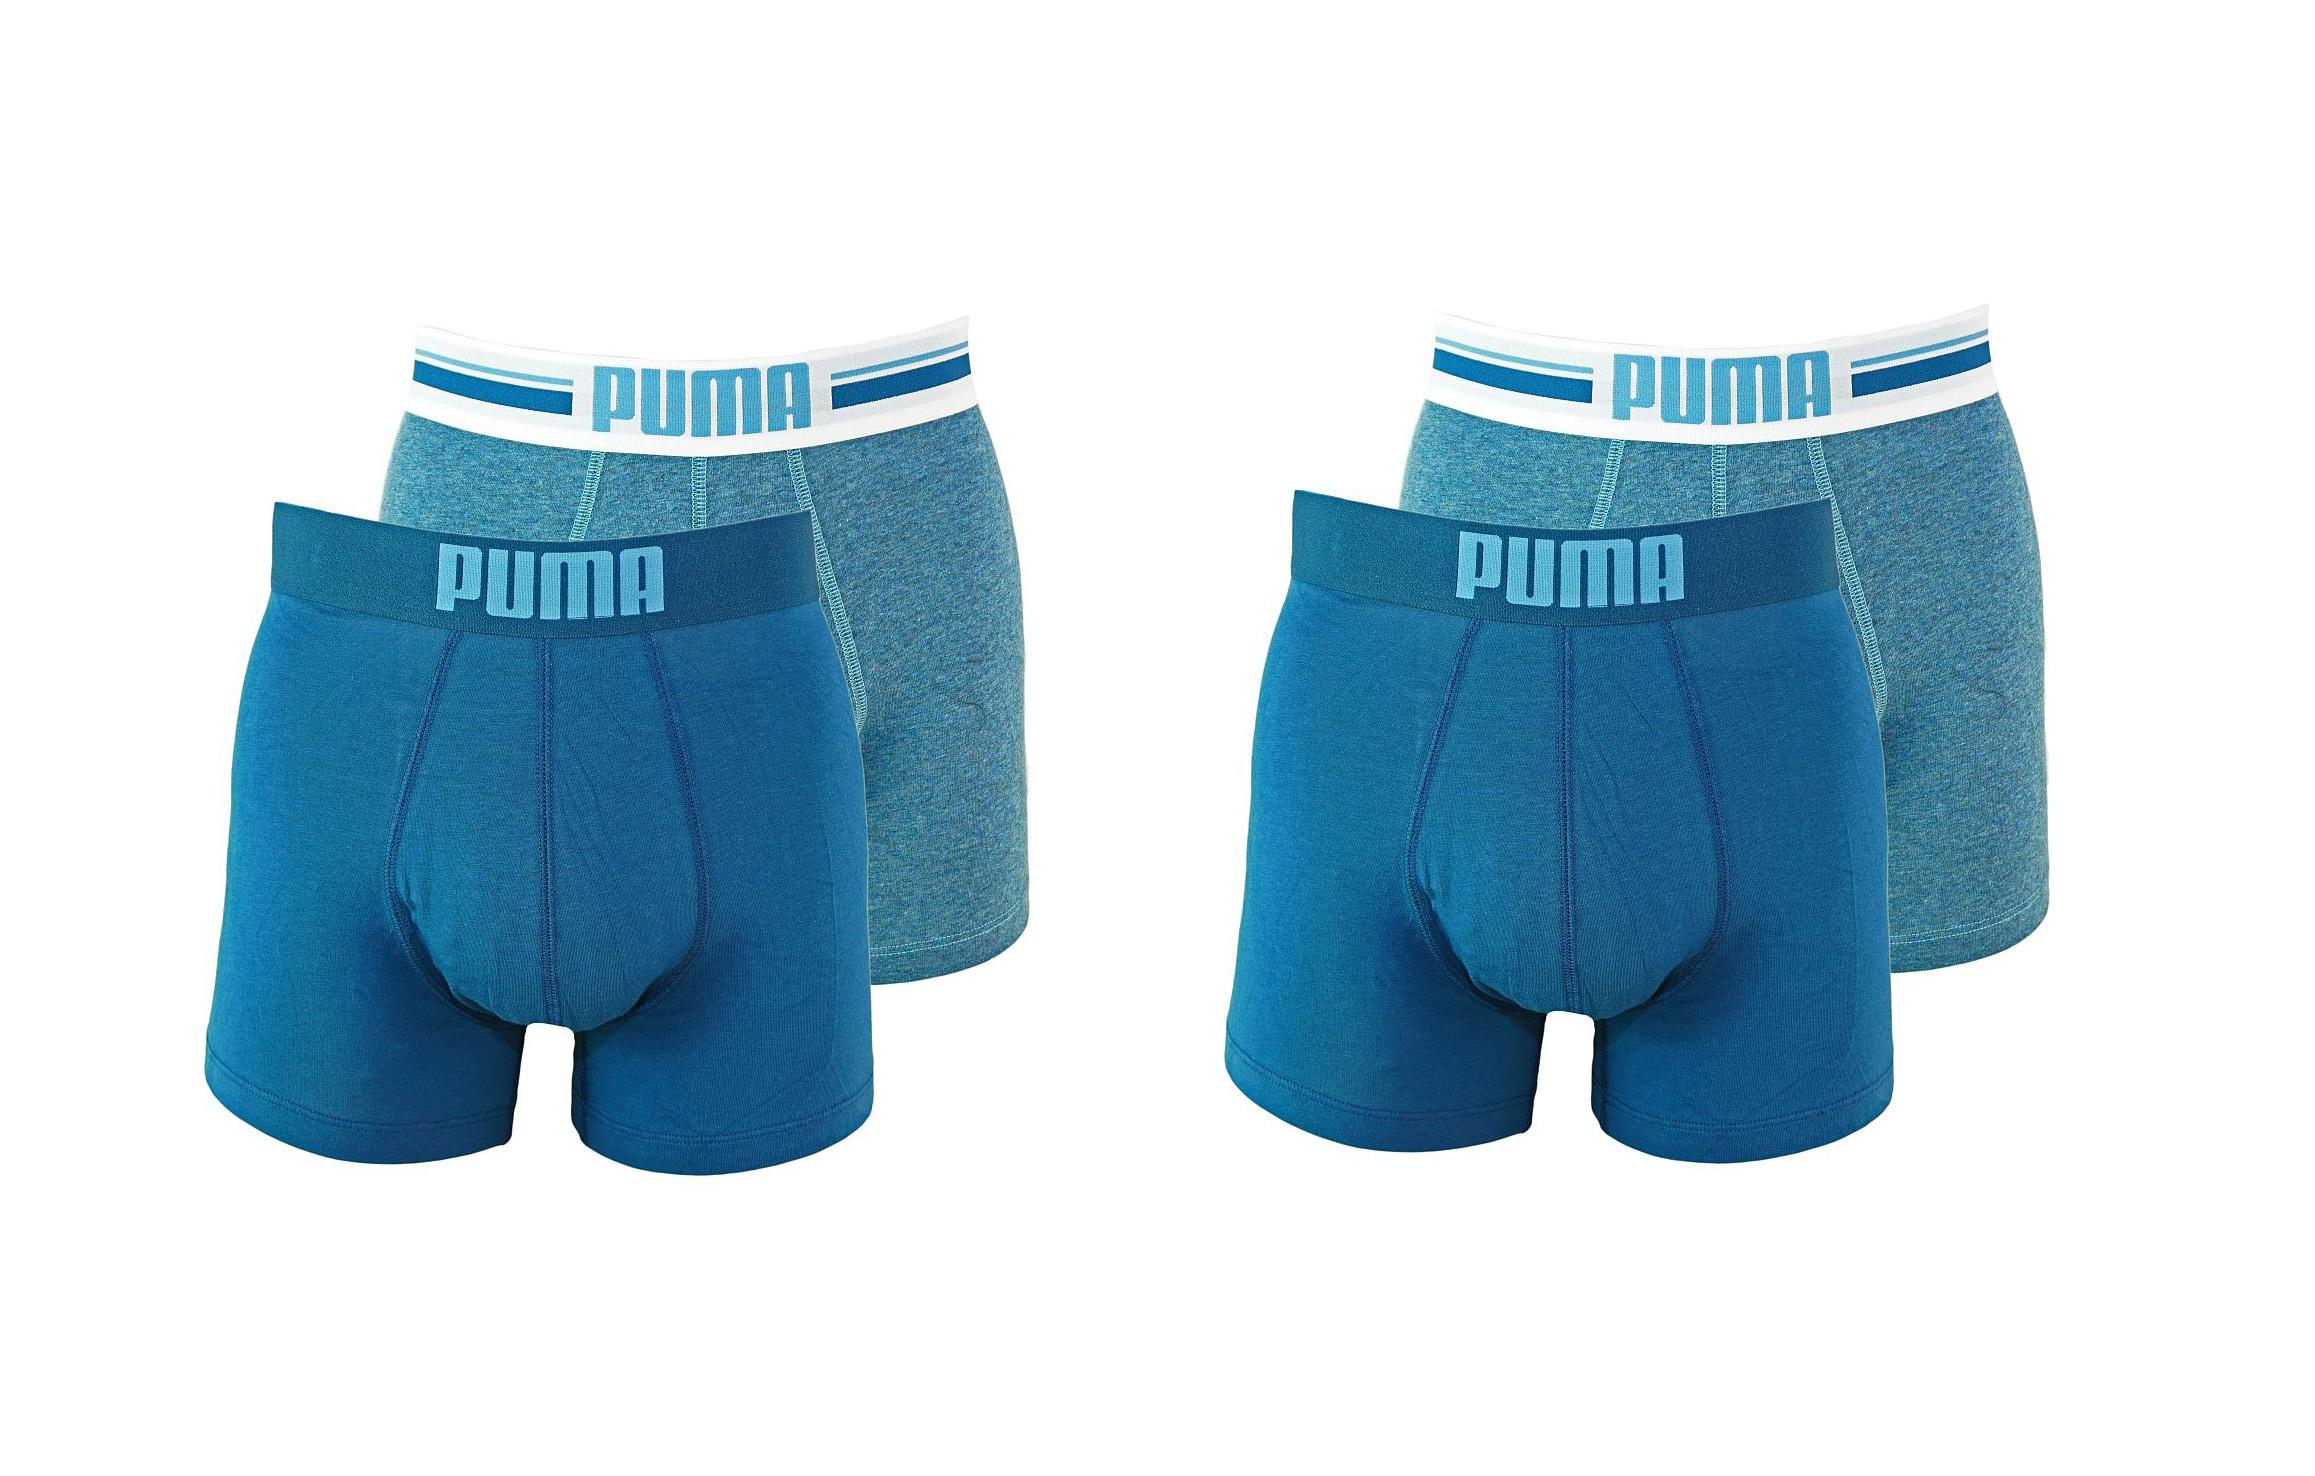 PUMA Shorts Unterhosen 2 x 2er Pack Boxer 651003001 162 020 denim SF17-PMS2